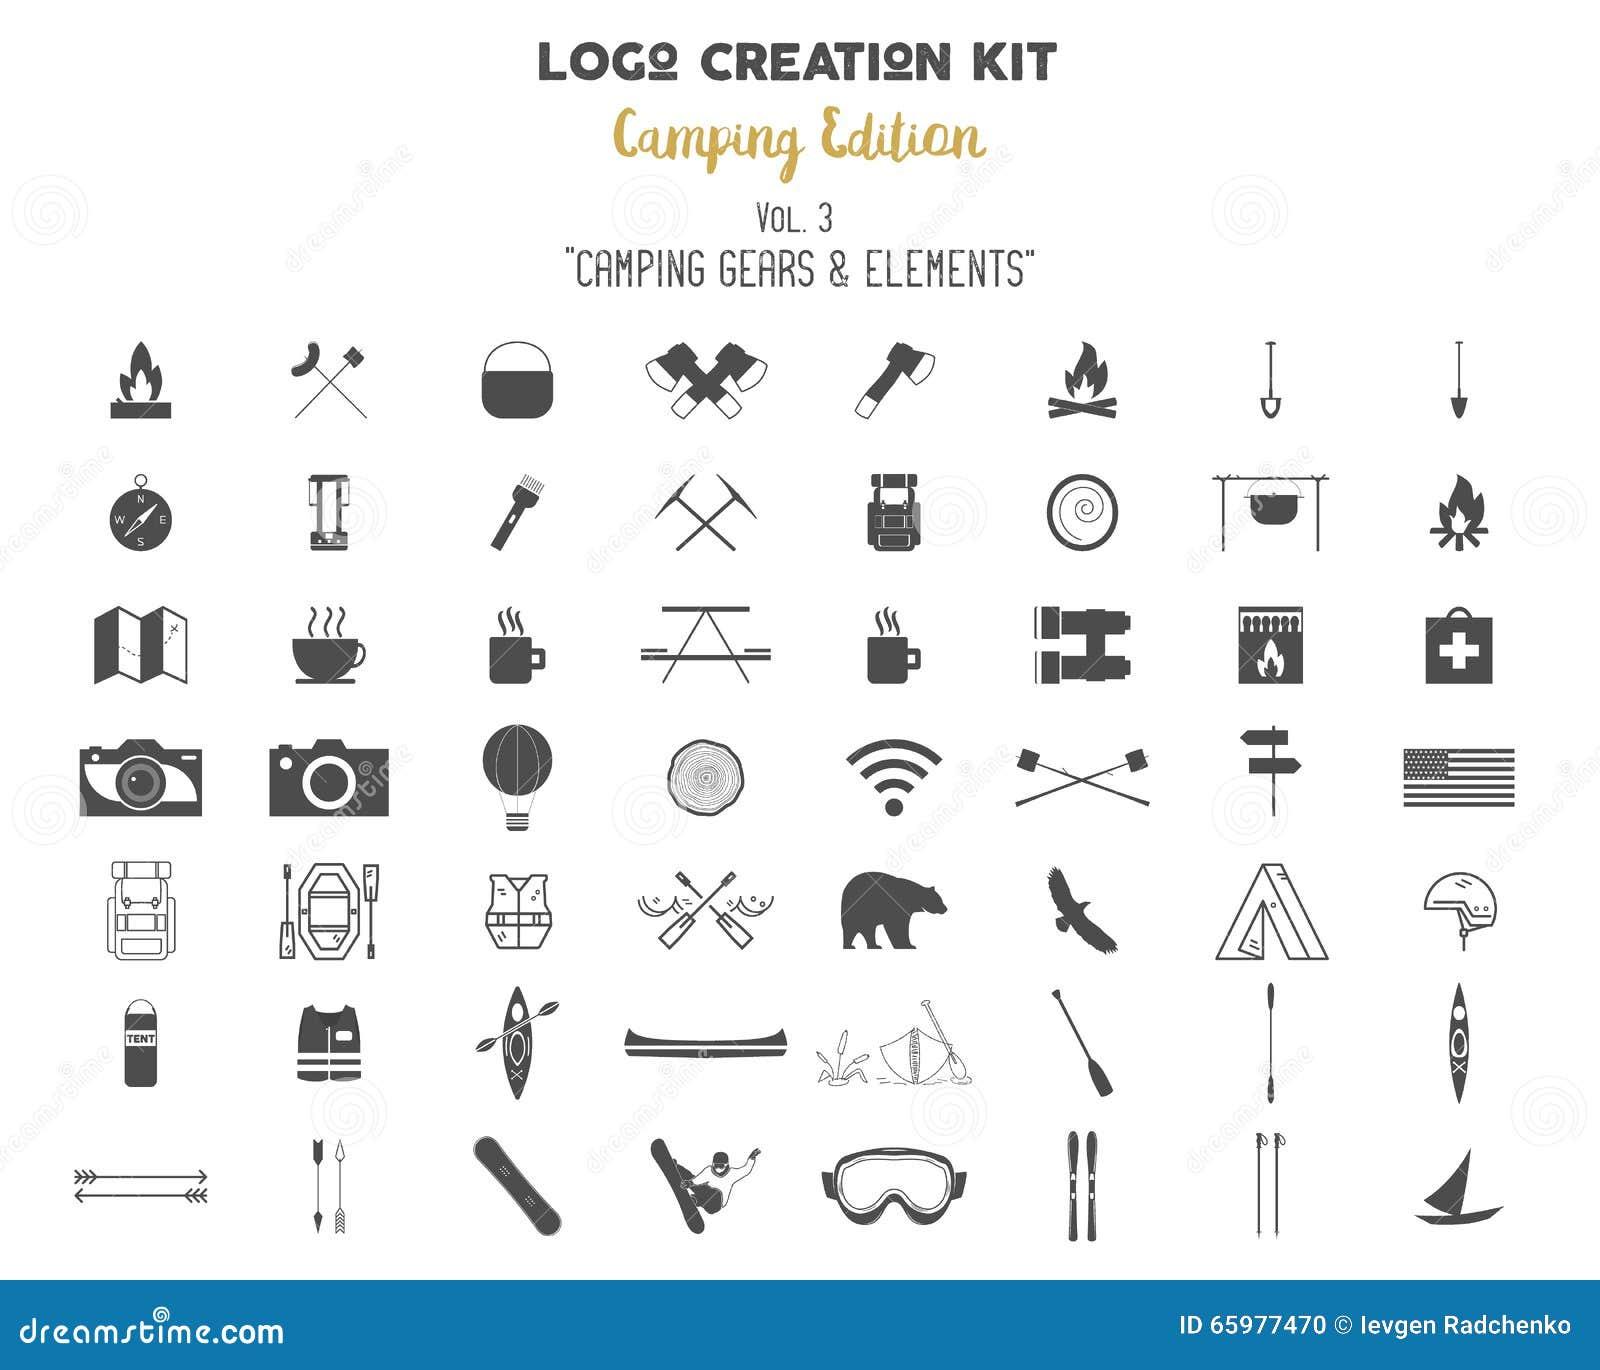 Logo Creation Kit Bundle Camping Edition Set Travel Gear Vector